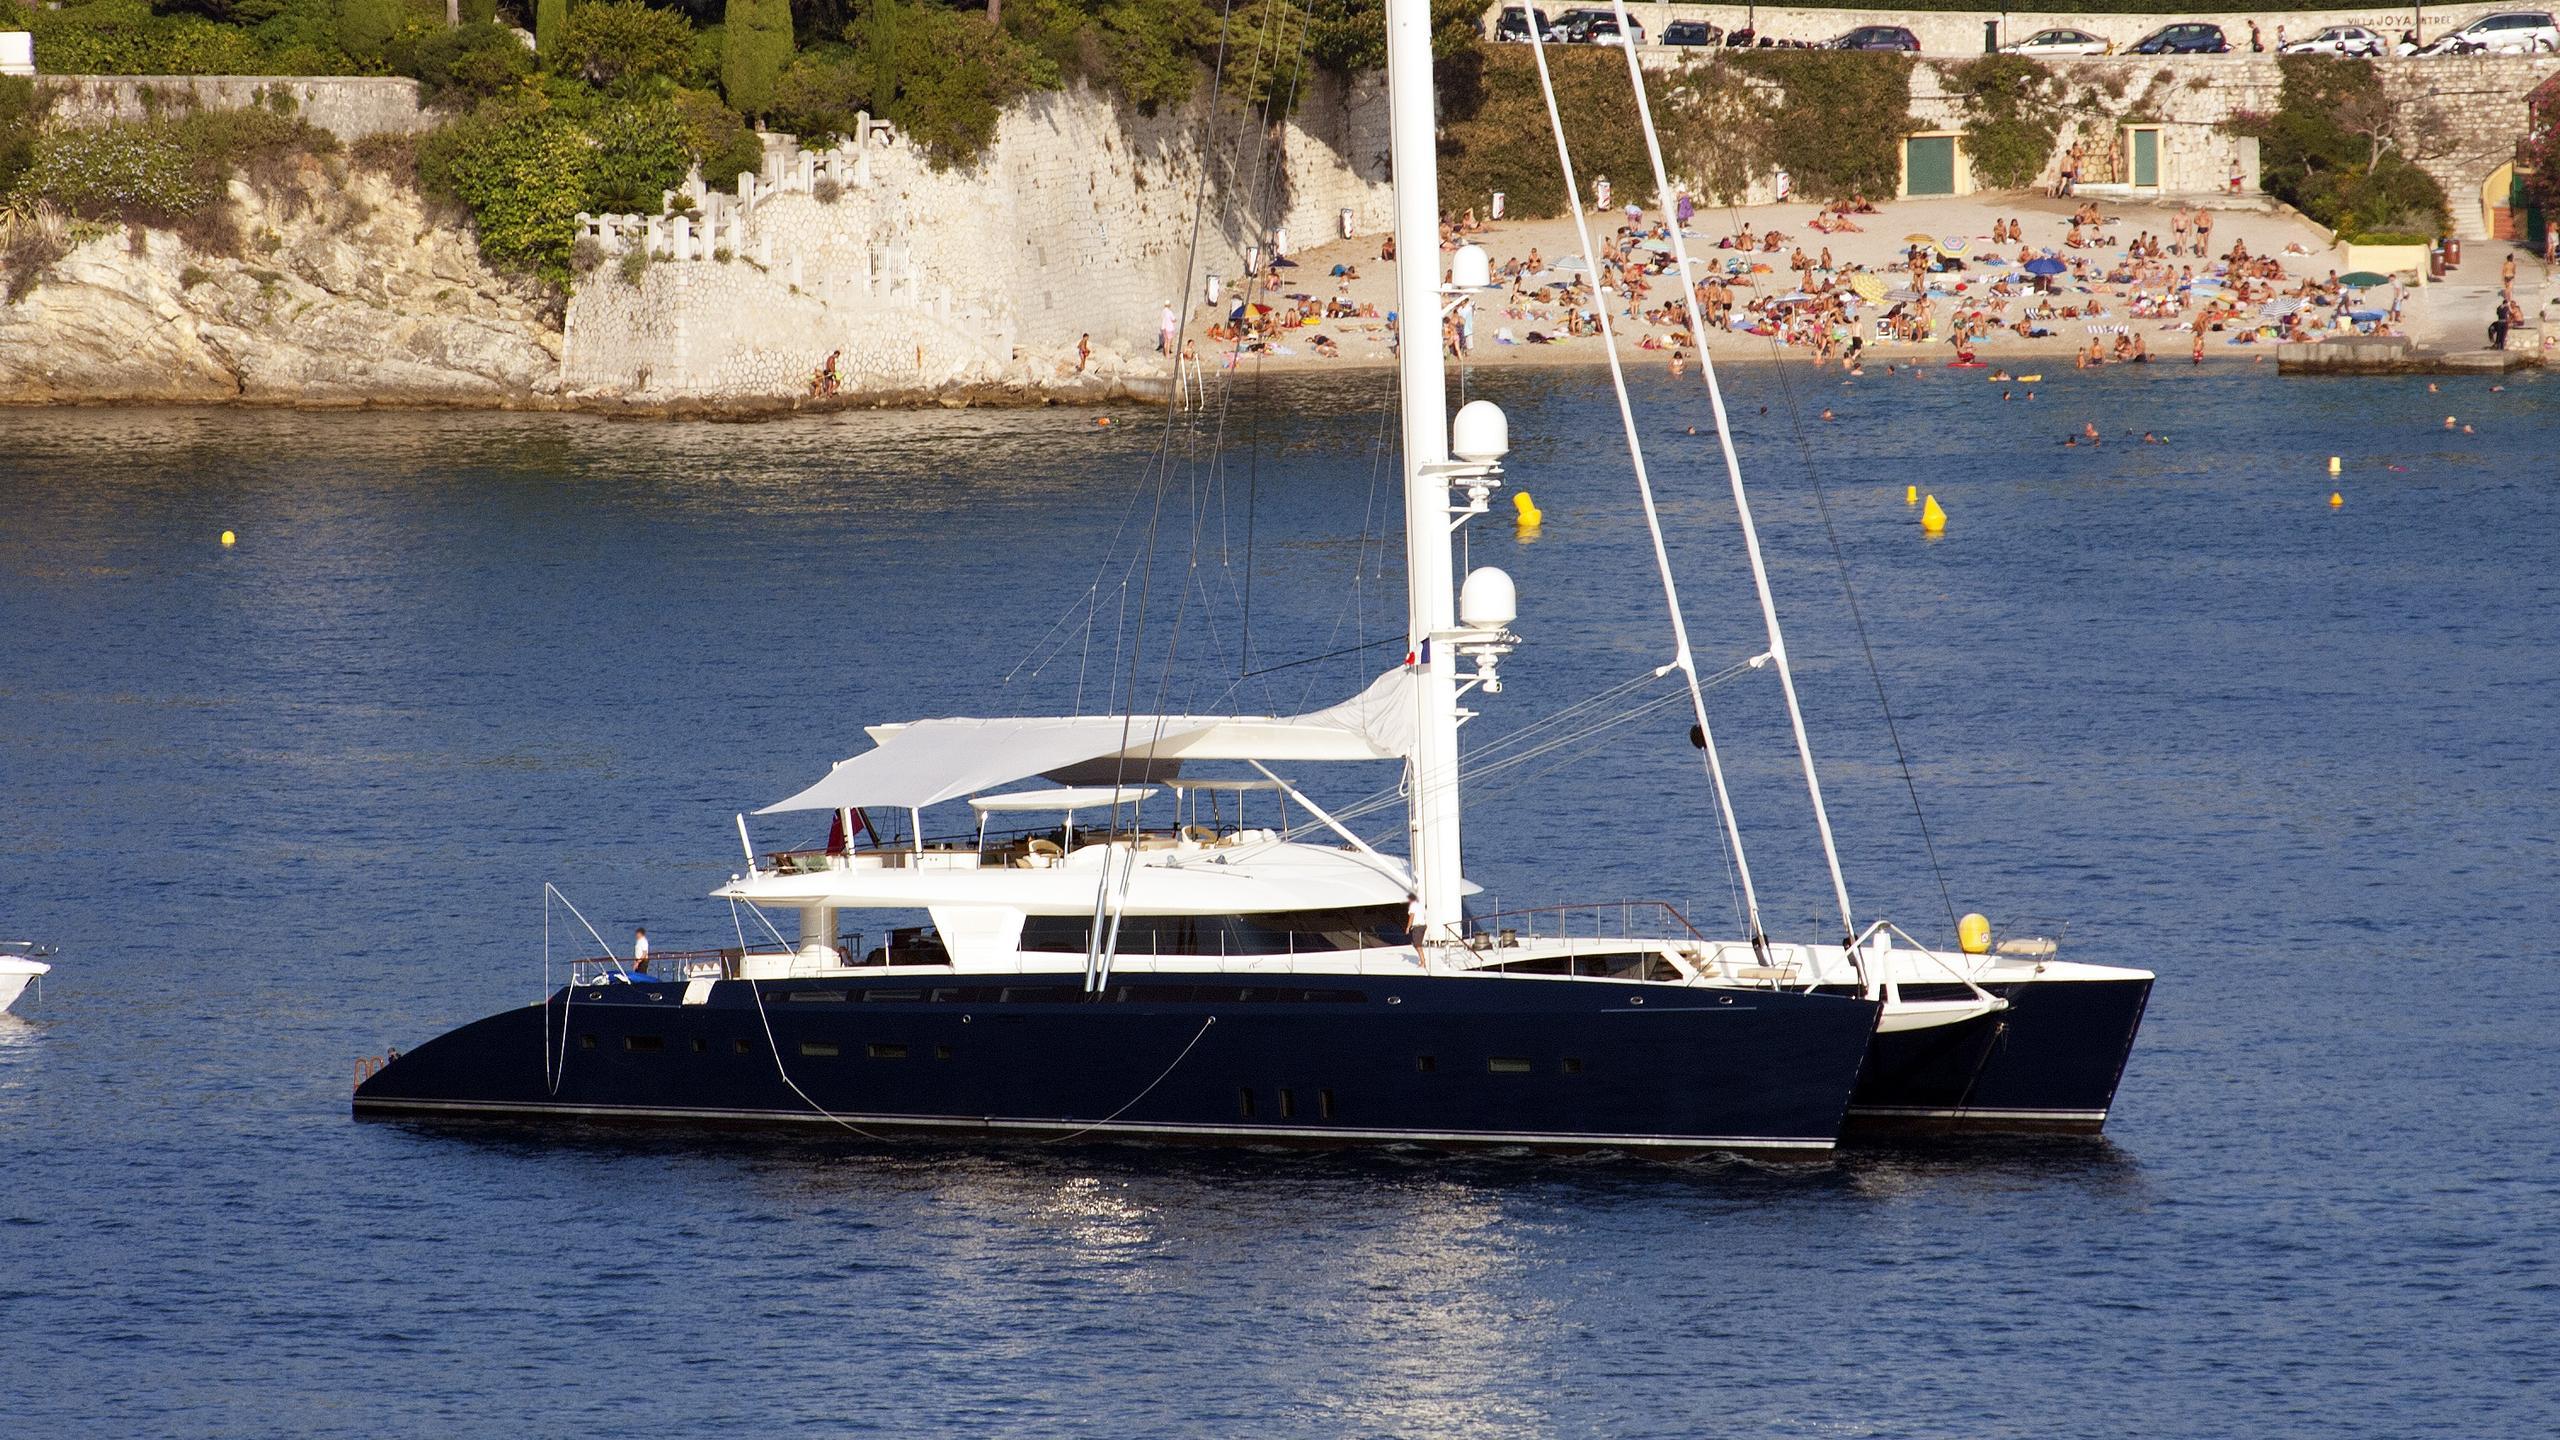 hemisphere-sailing-yacht-pendennis-2011-44m-profile